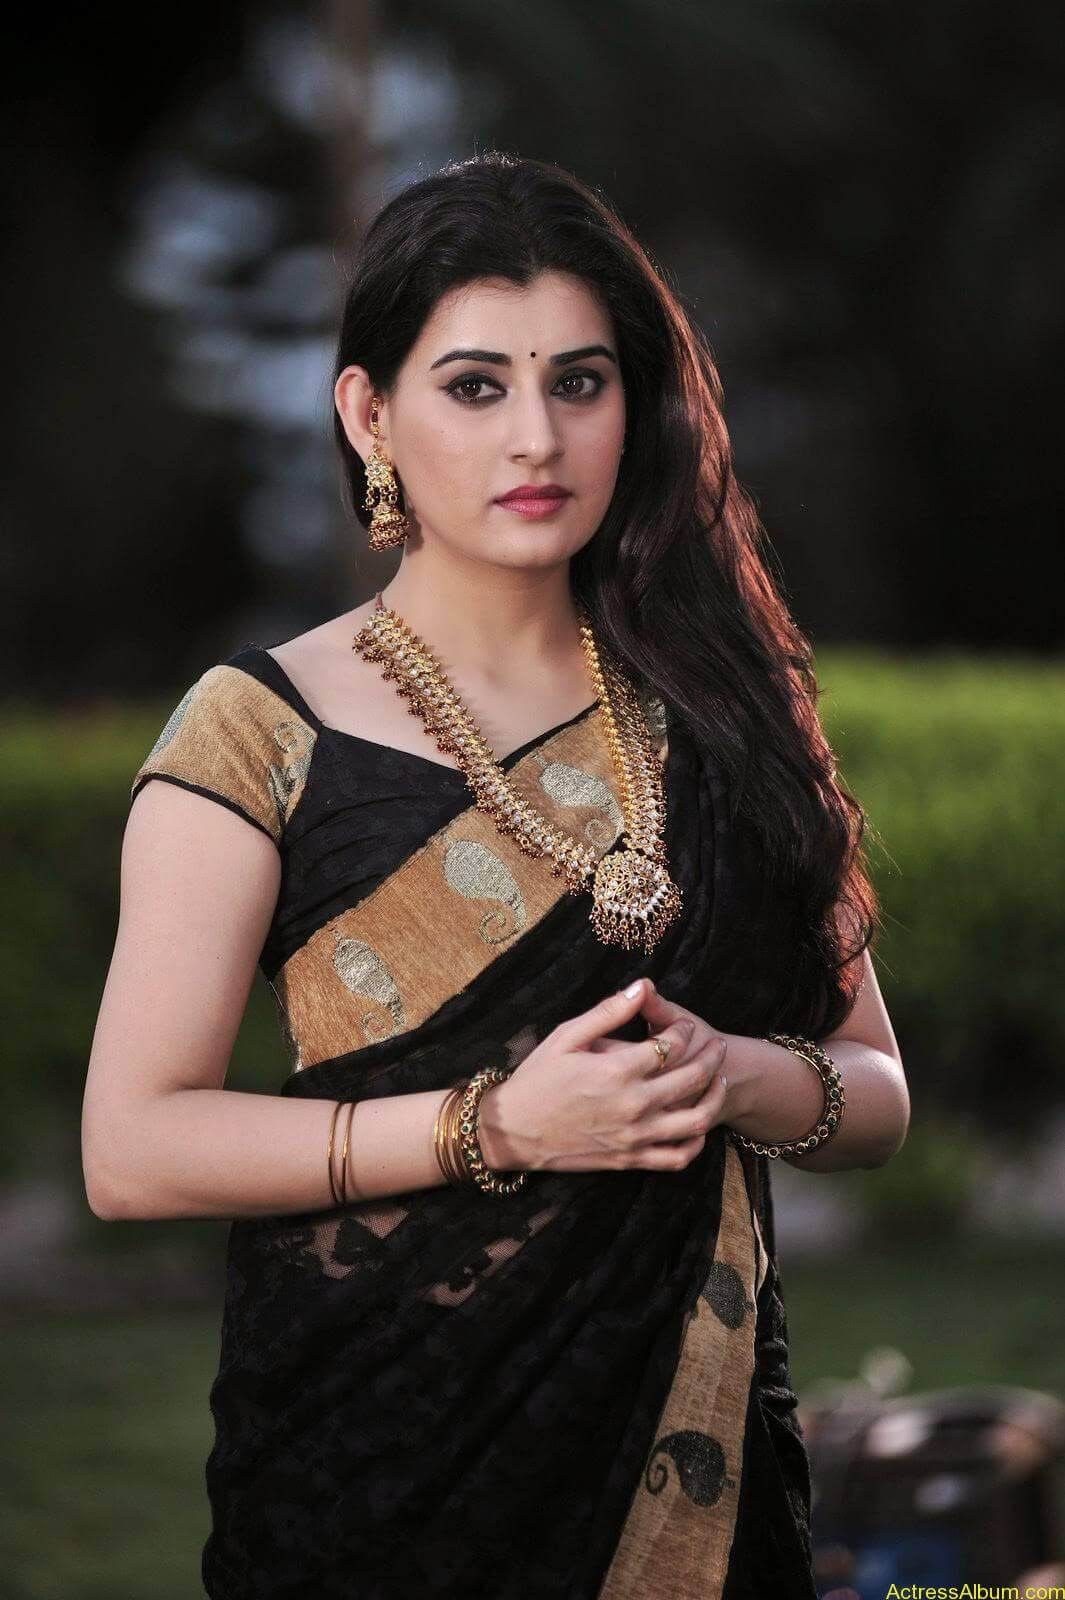 Archana-Stills-From-Anandini-Movie-17